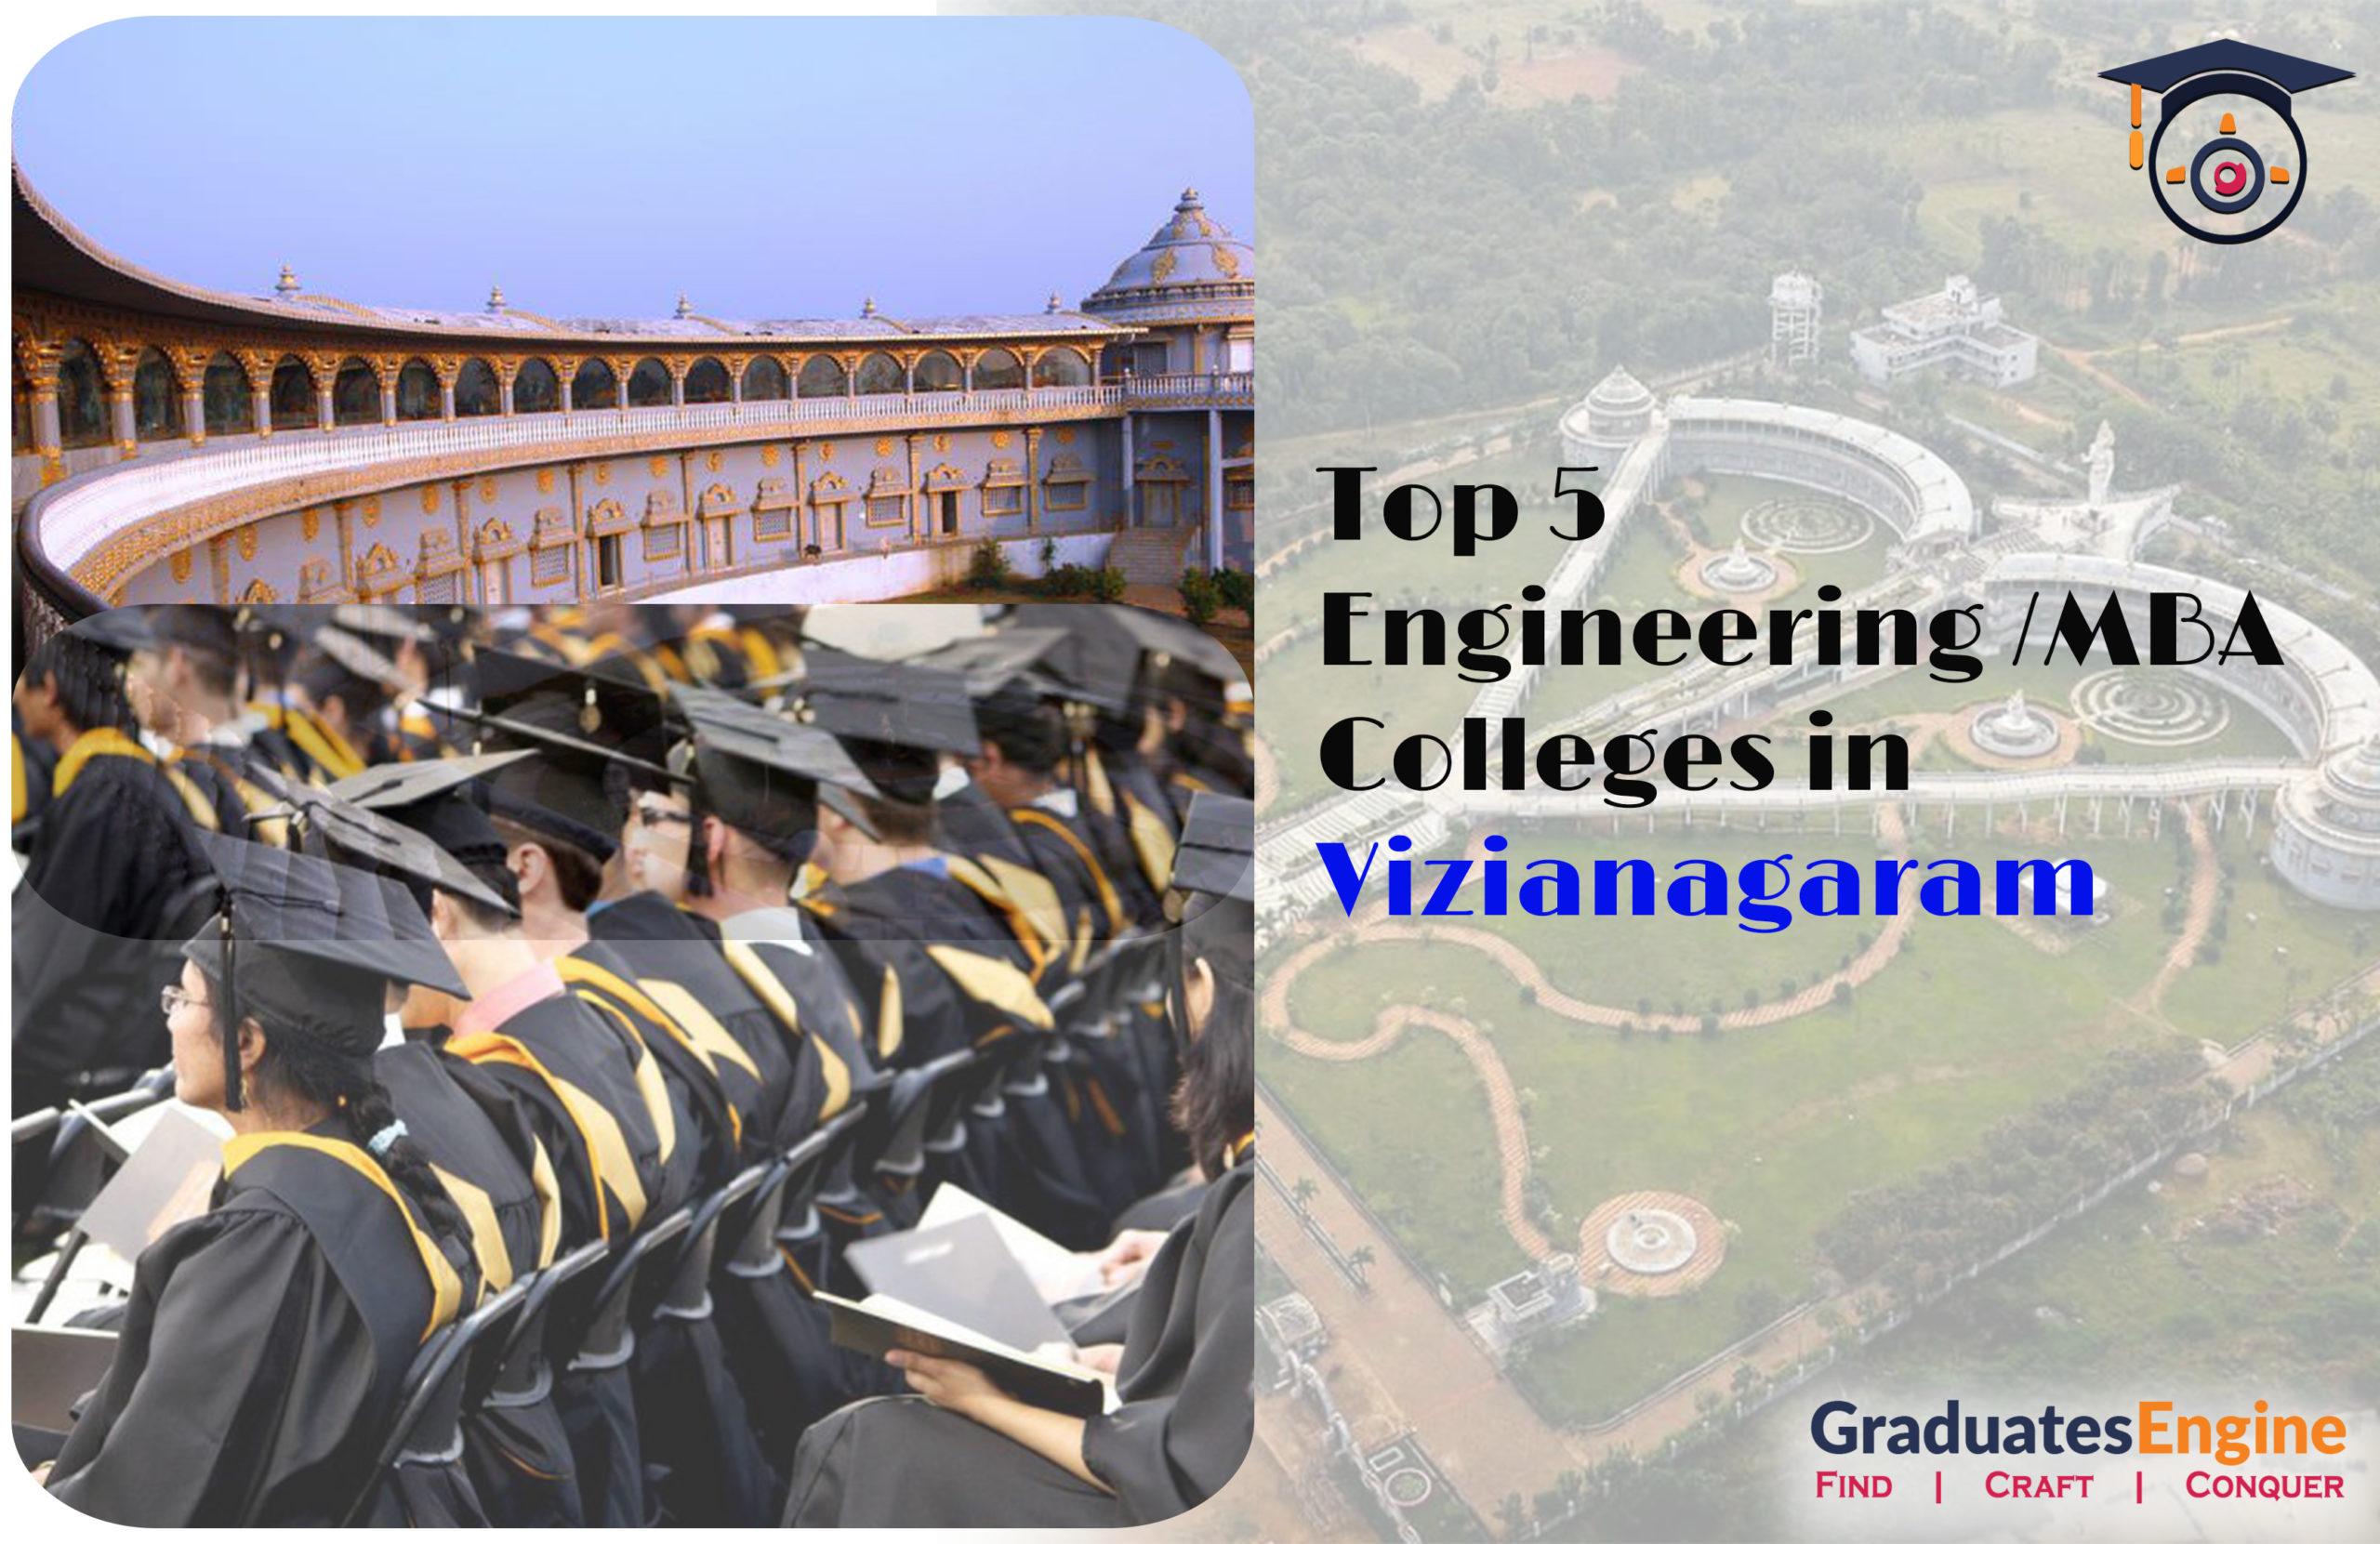 Top Engineering/MBA colleges in Vizianagaram